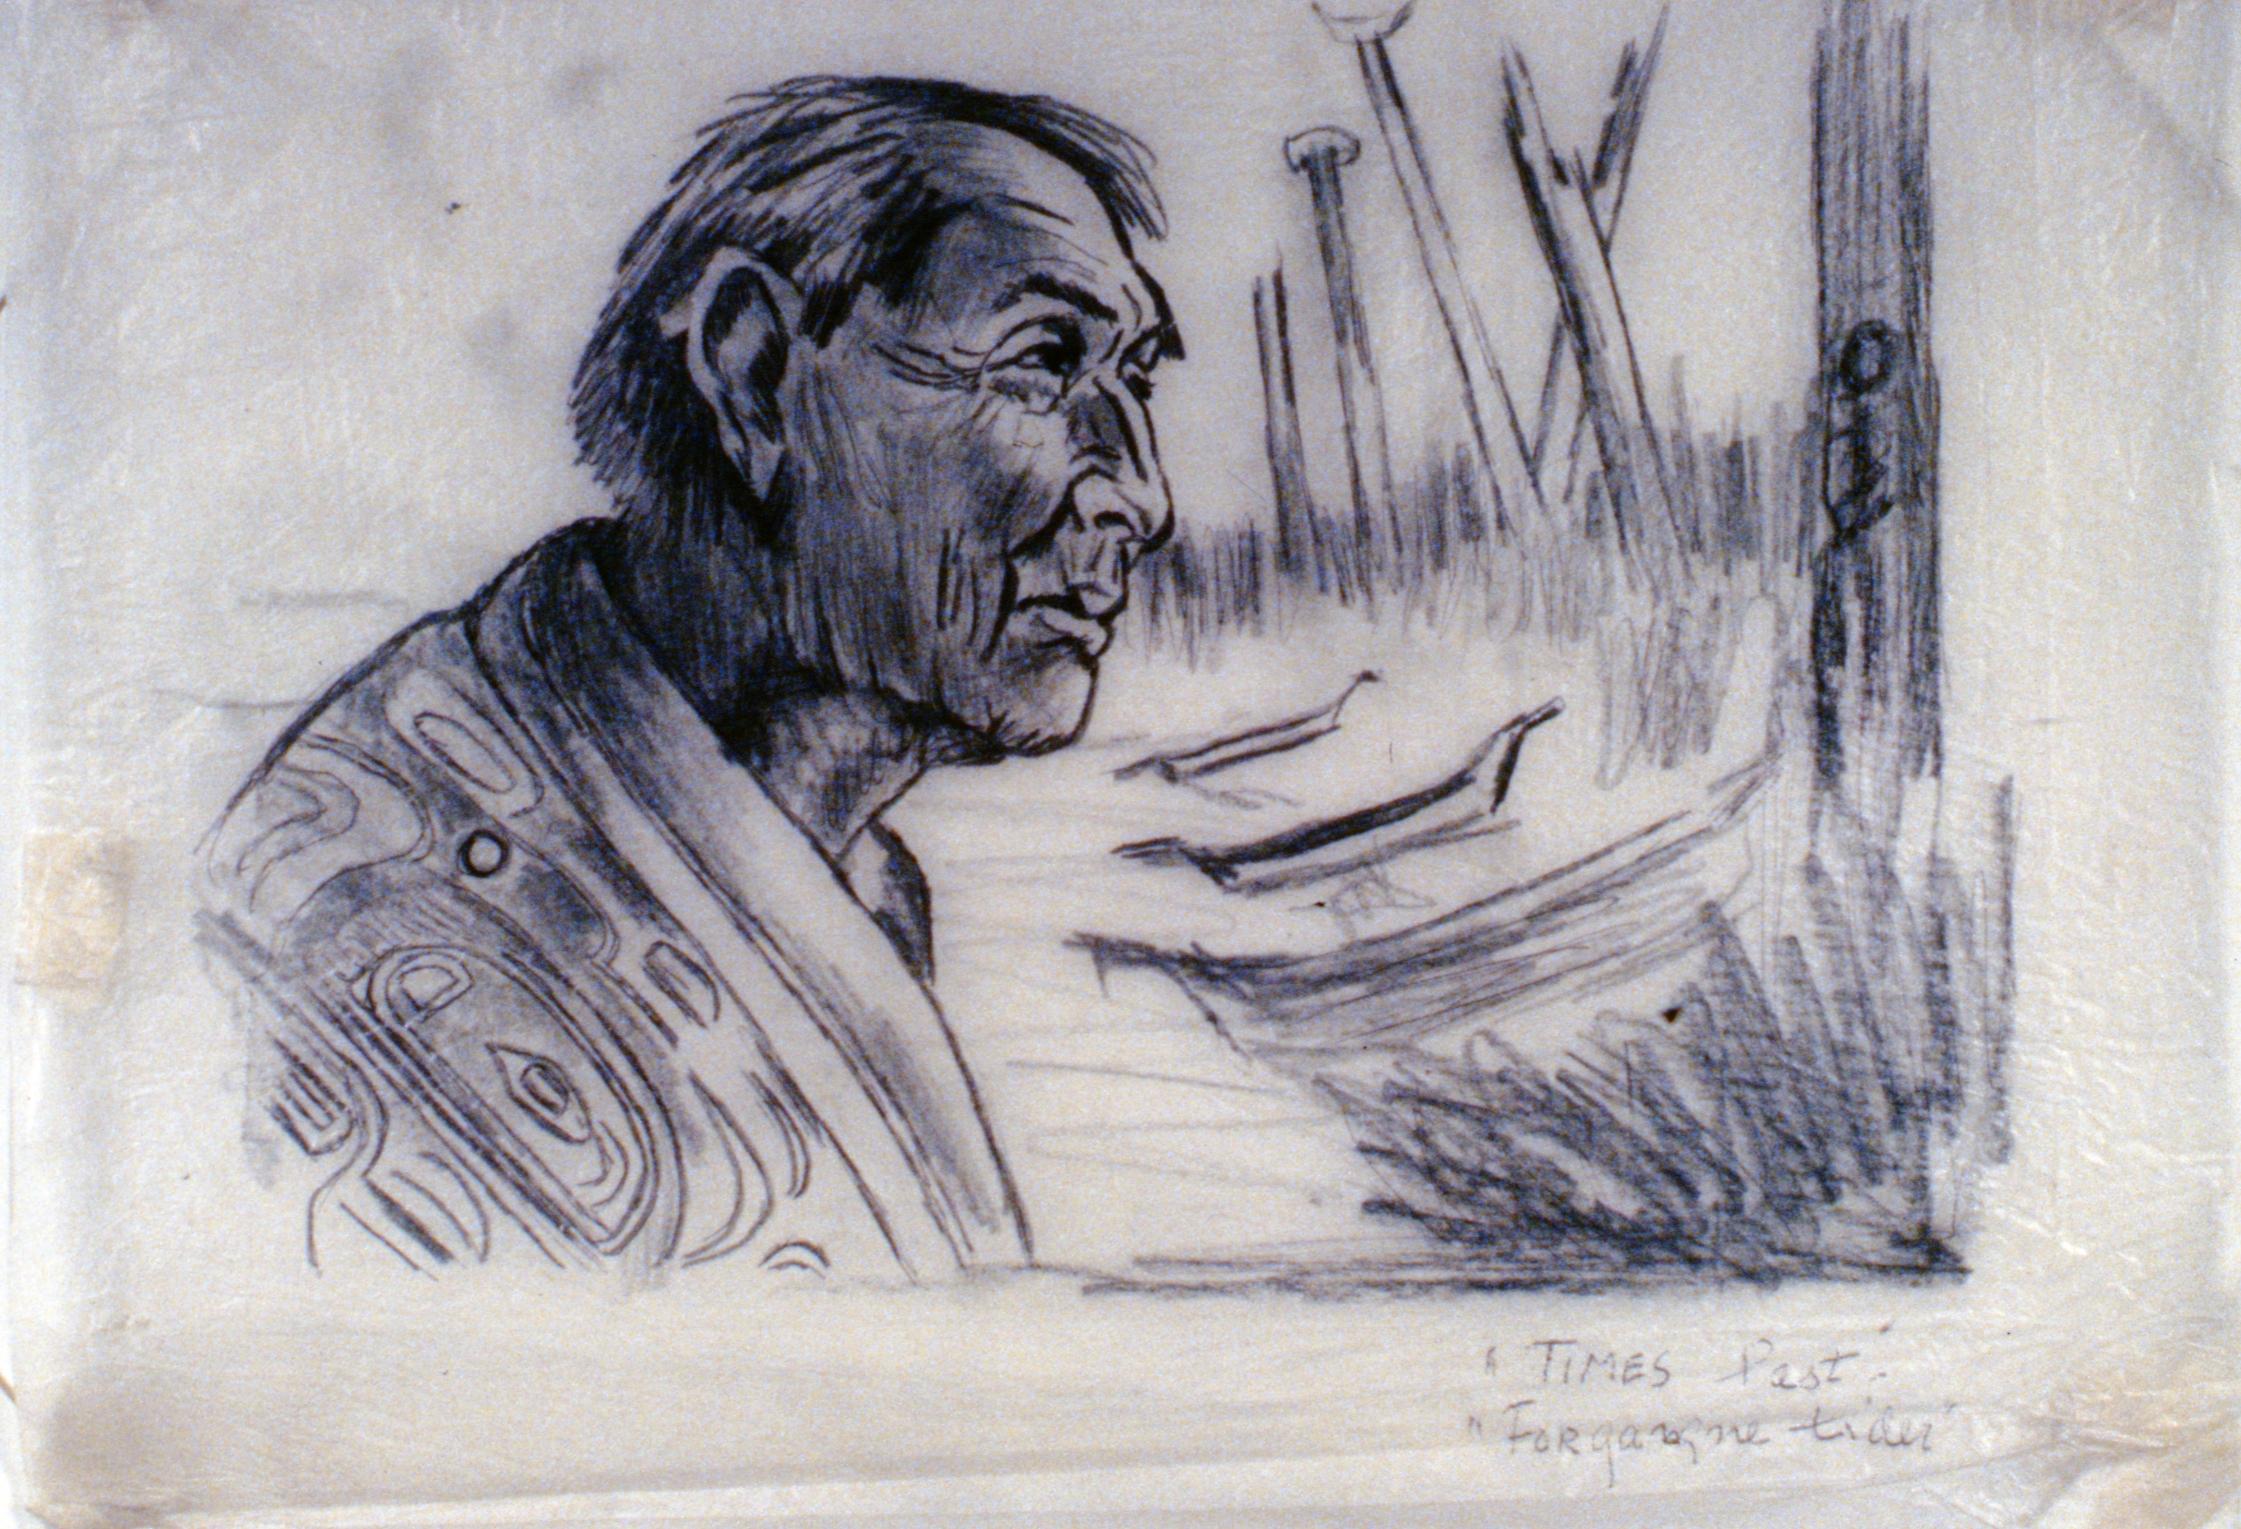 Times Past , 1978, Minn Sjølseth, sketch, 23.5 x 32cm, 1996.02.01